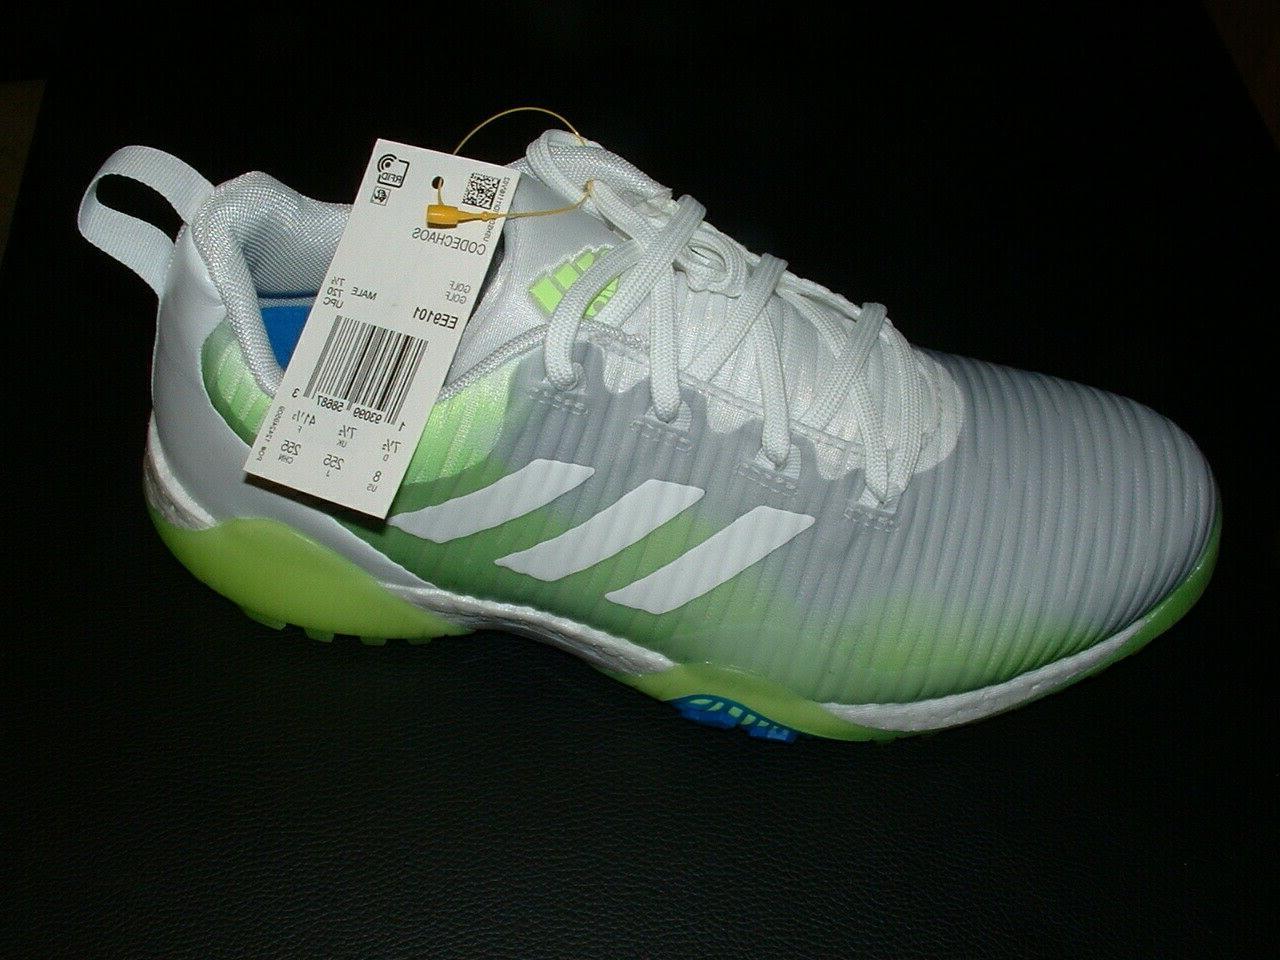 Shoes, Your #EE9102, EE9103 EE9101